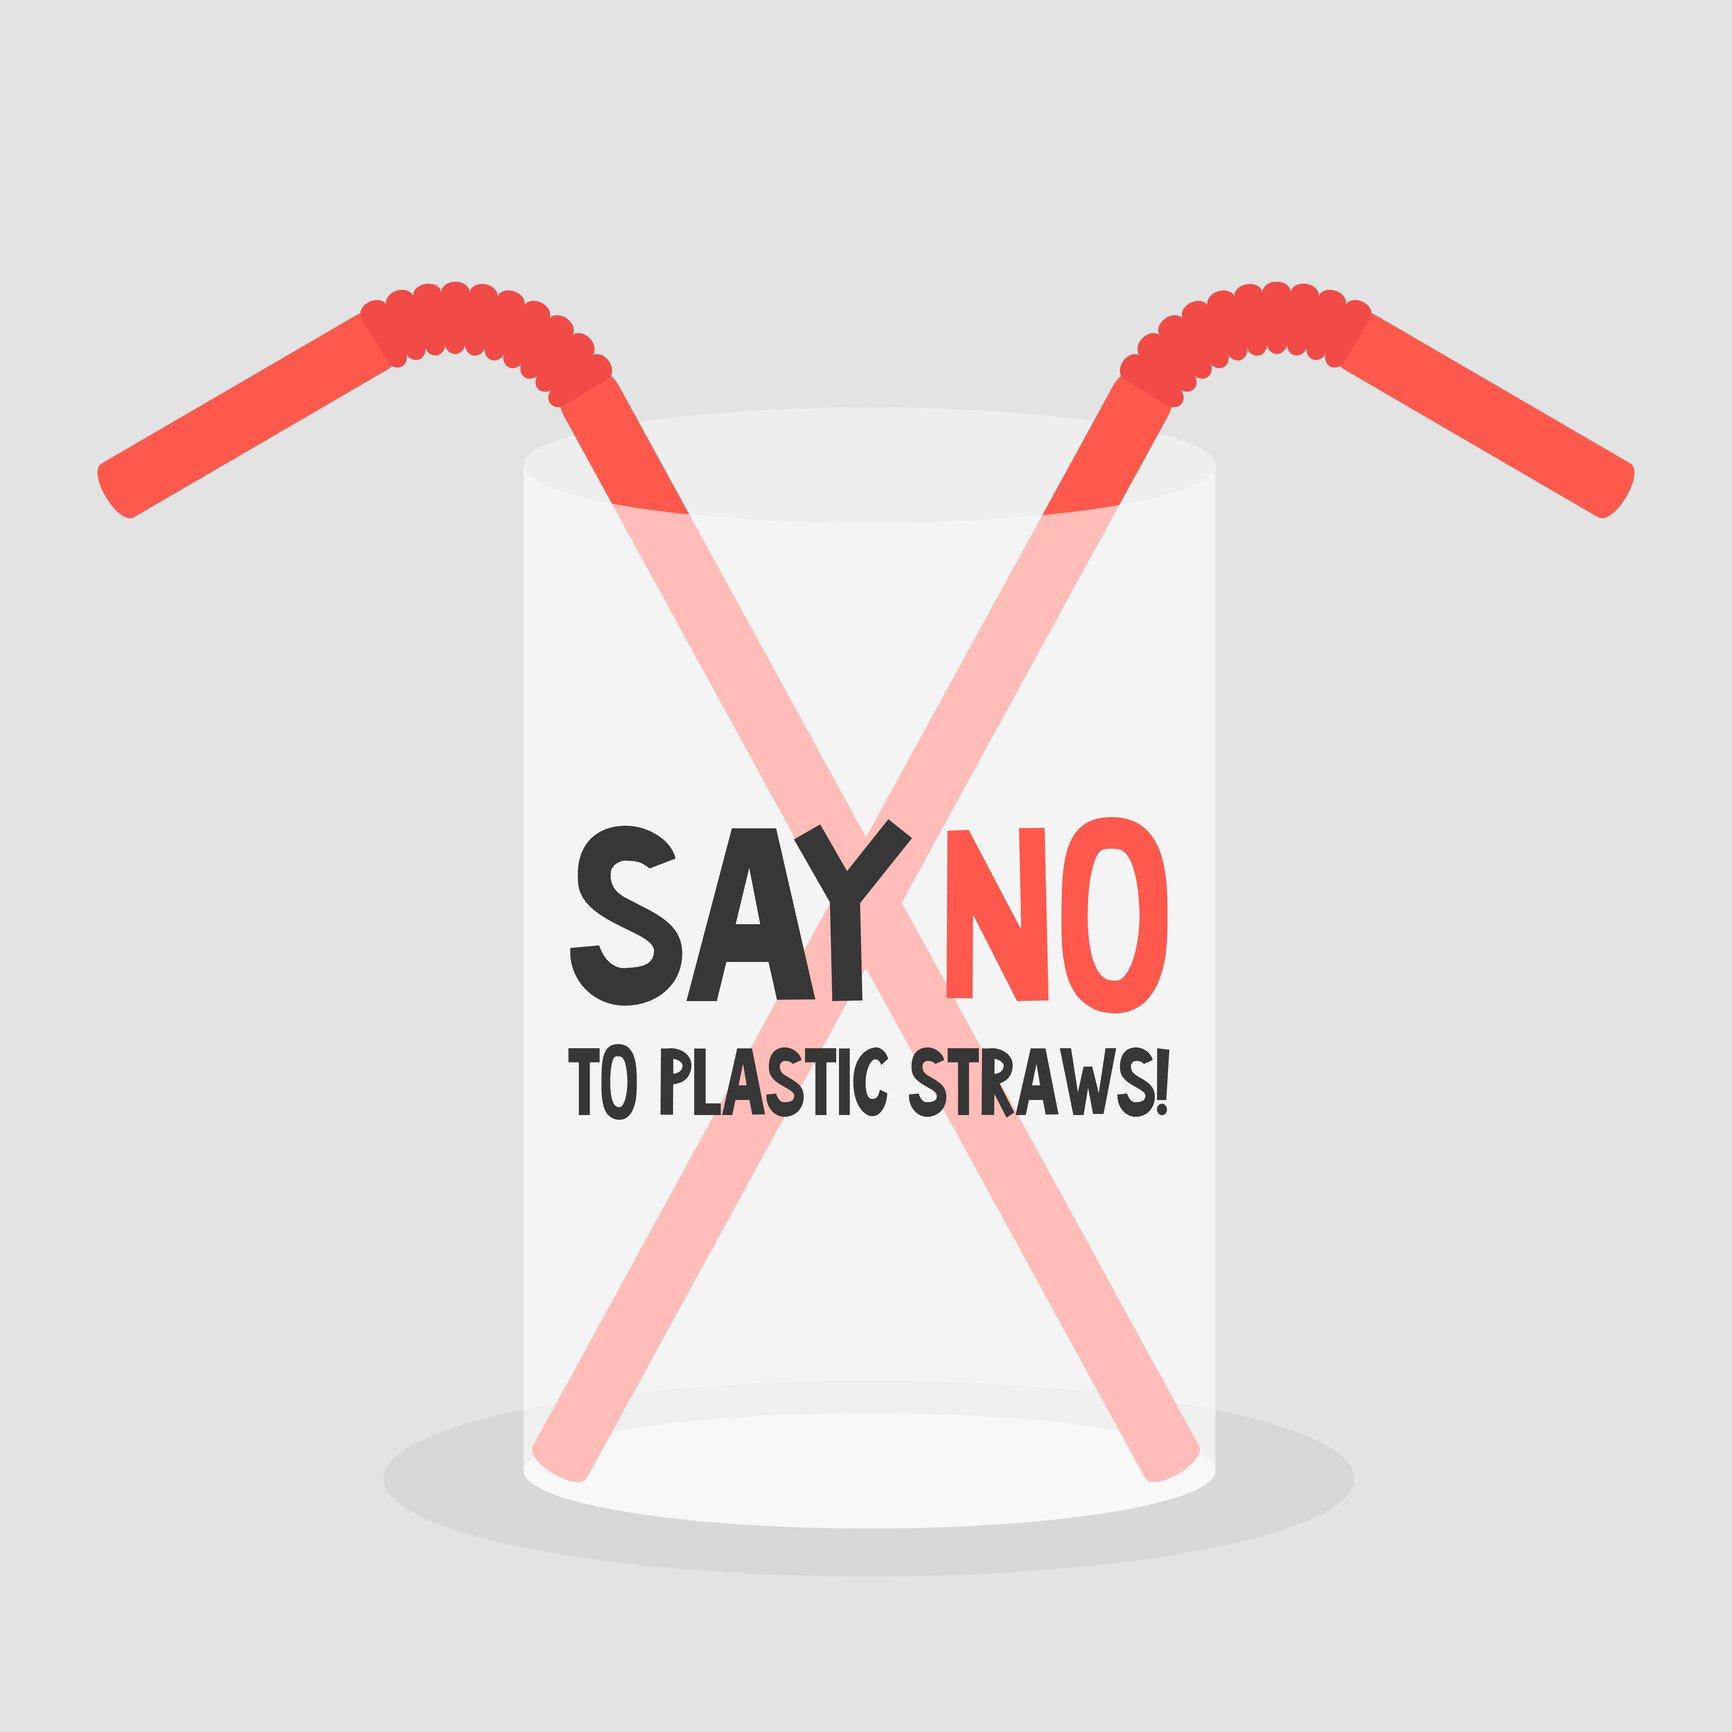 plastic-straw-ban